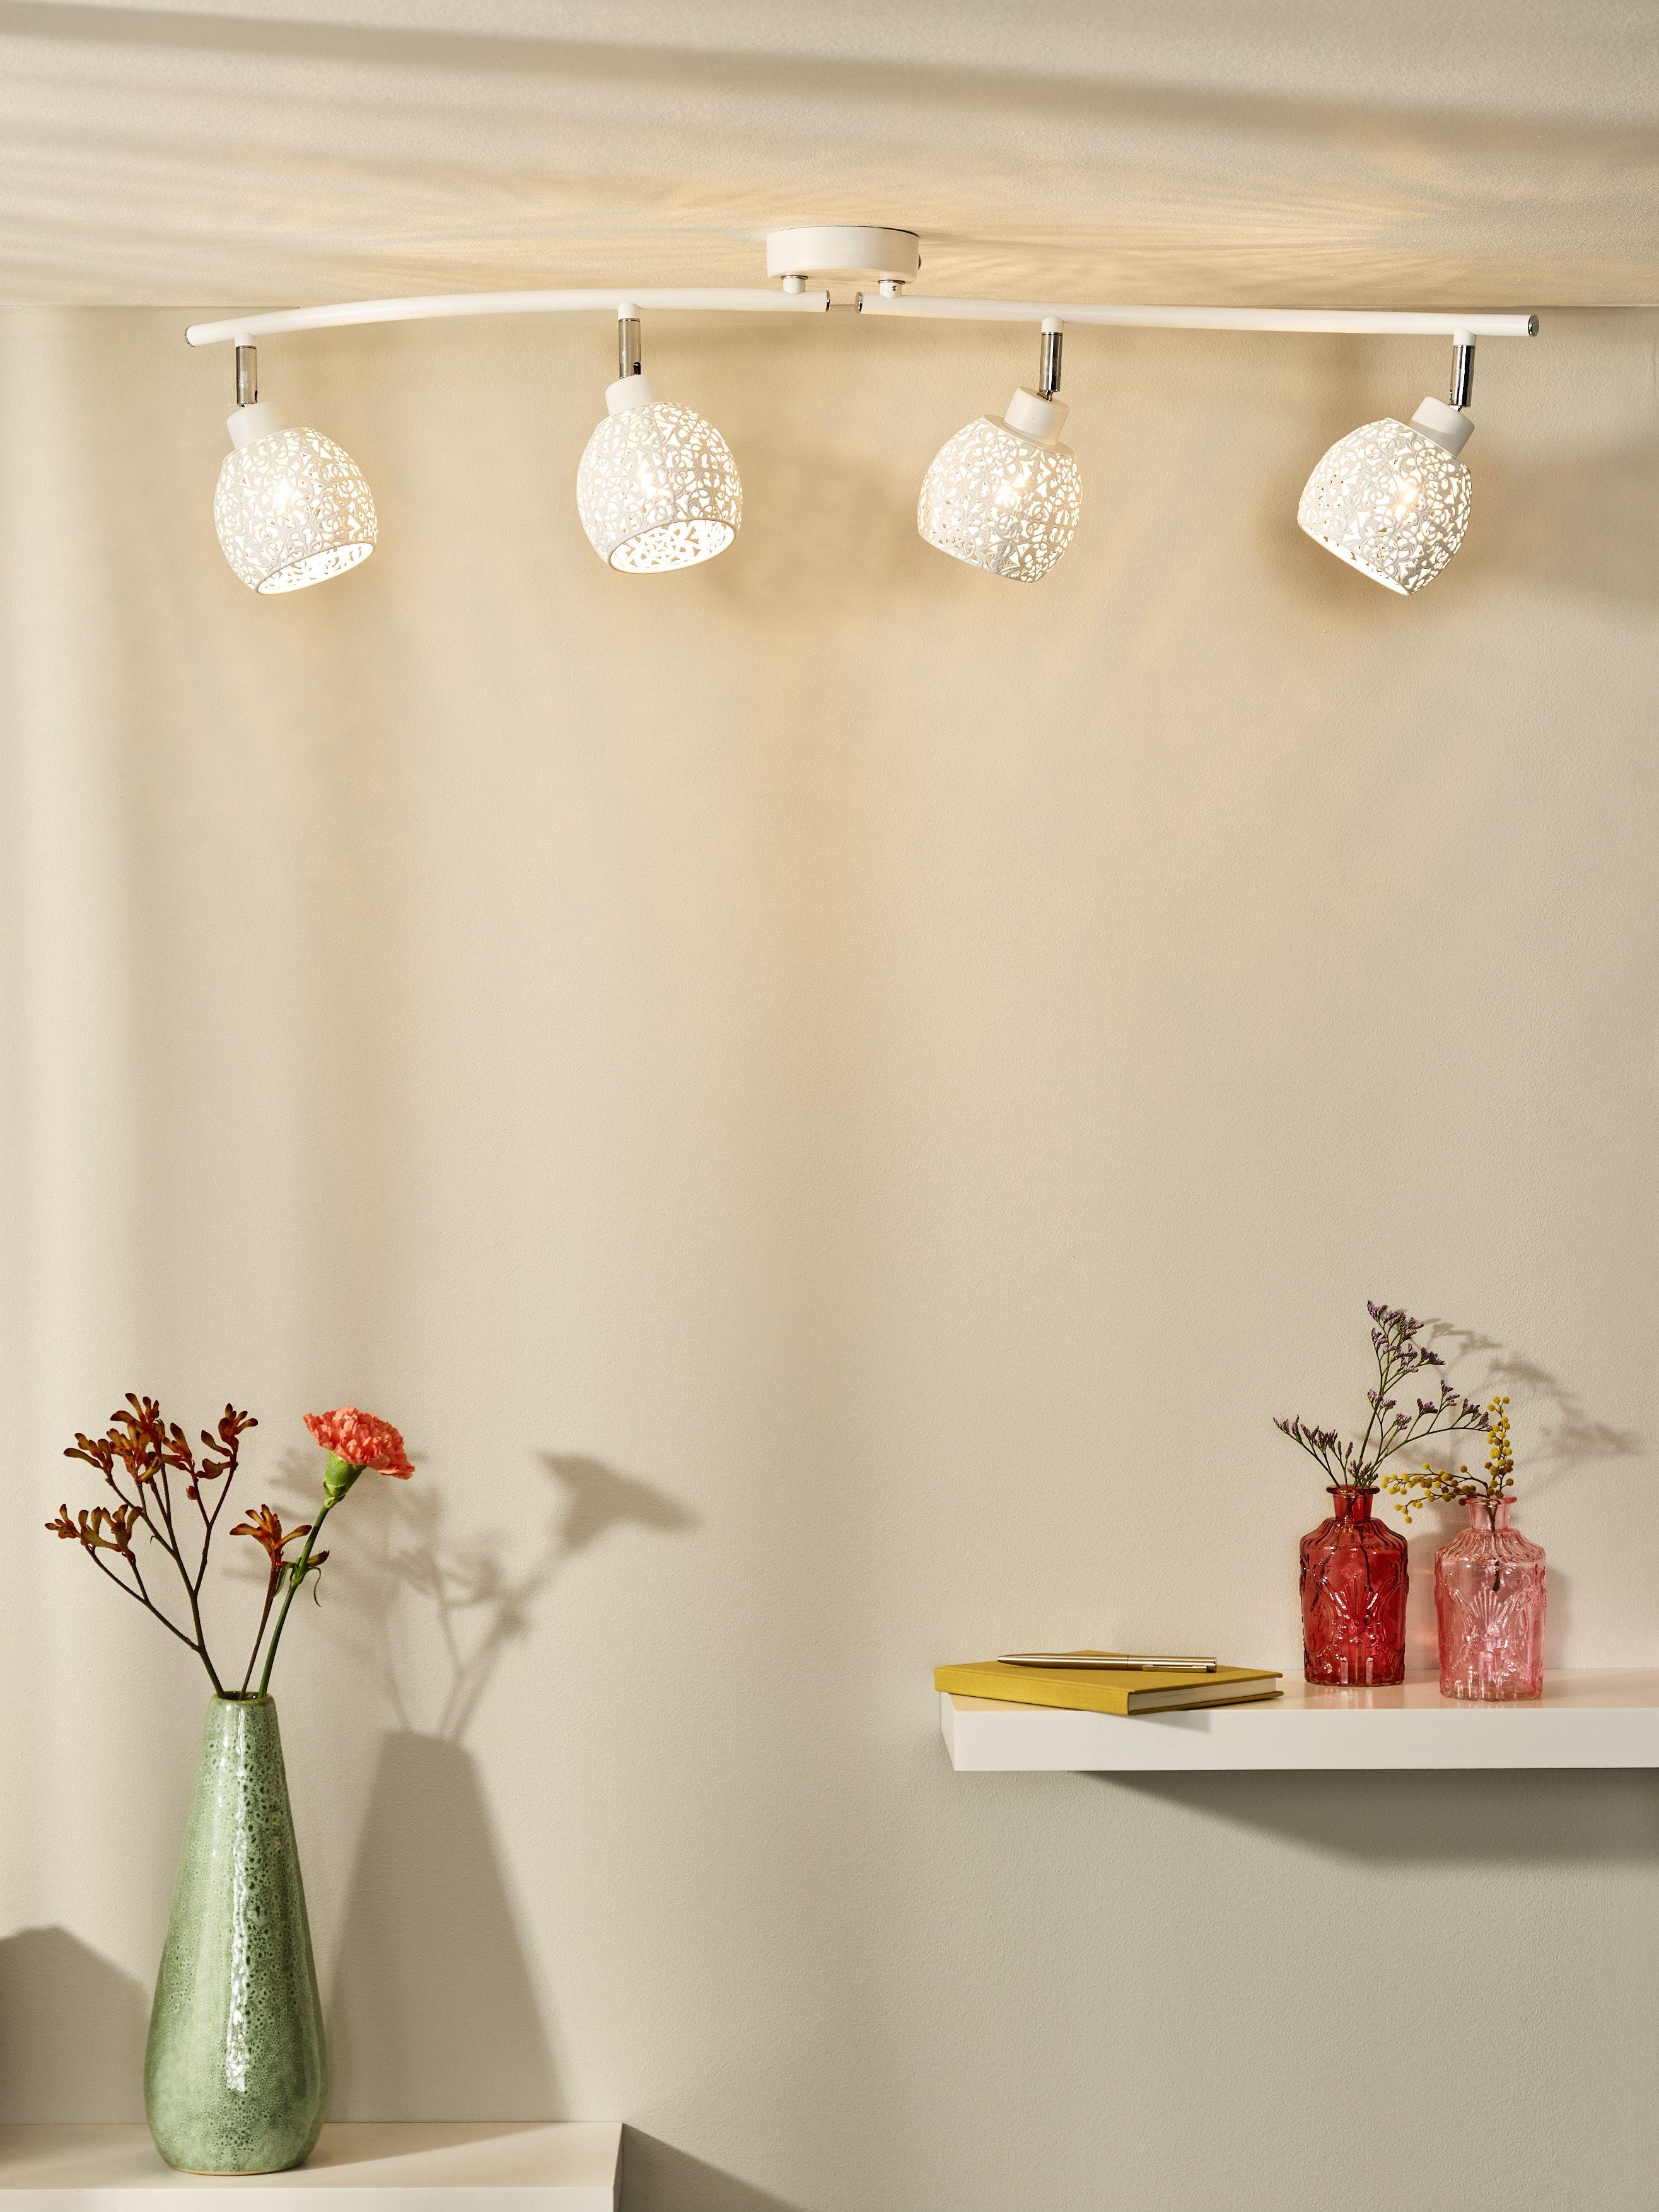 Lucide Tahar Spot Plafond O 9 Cm 4xg9 Blanc Plafondlamp Lampen Vintage